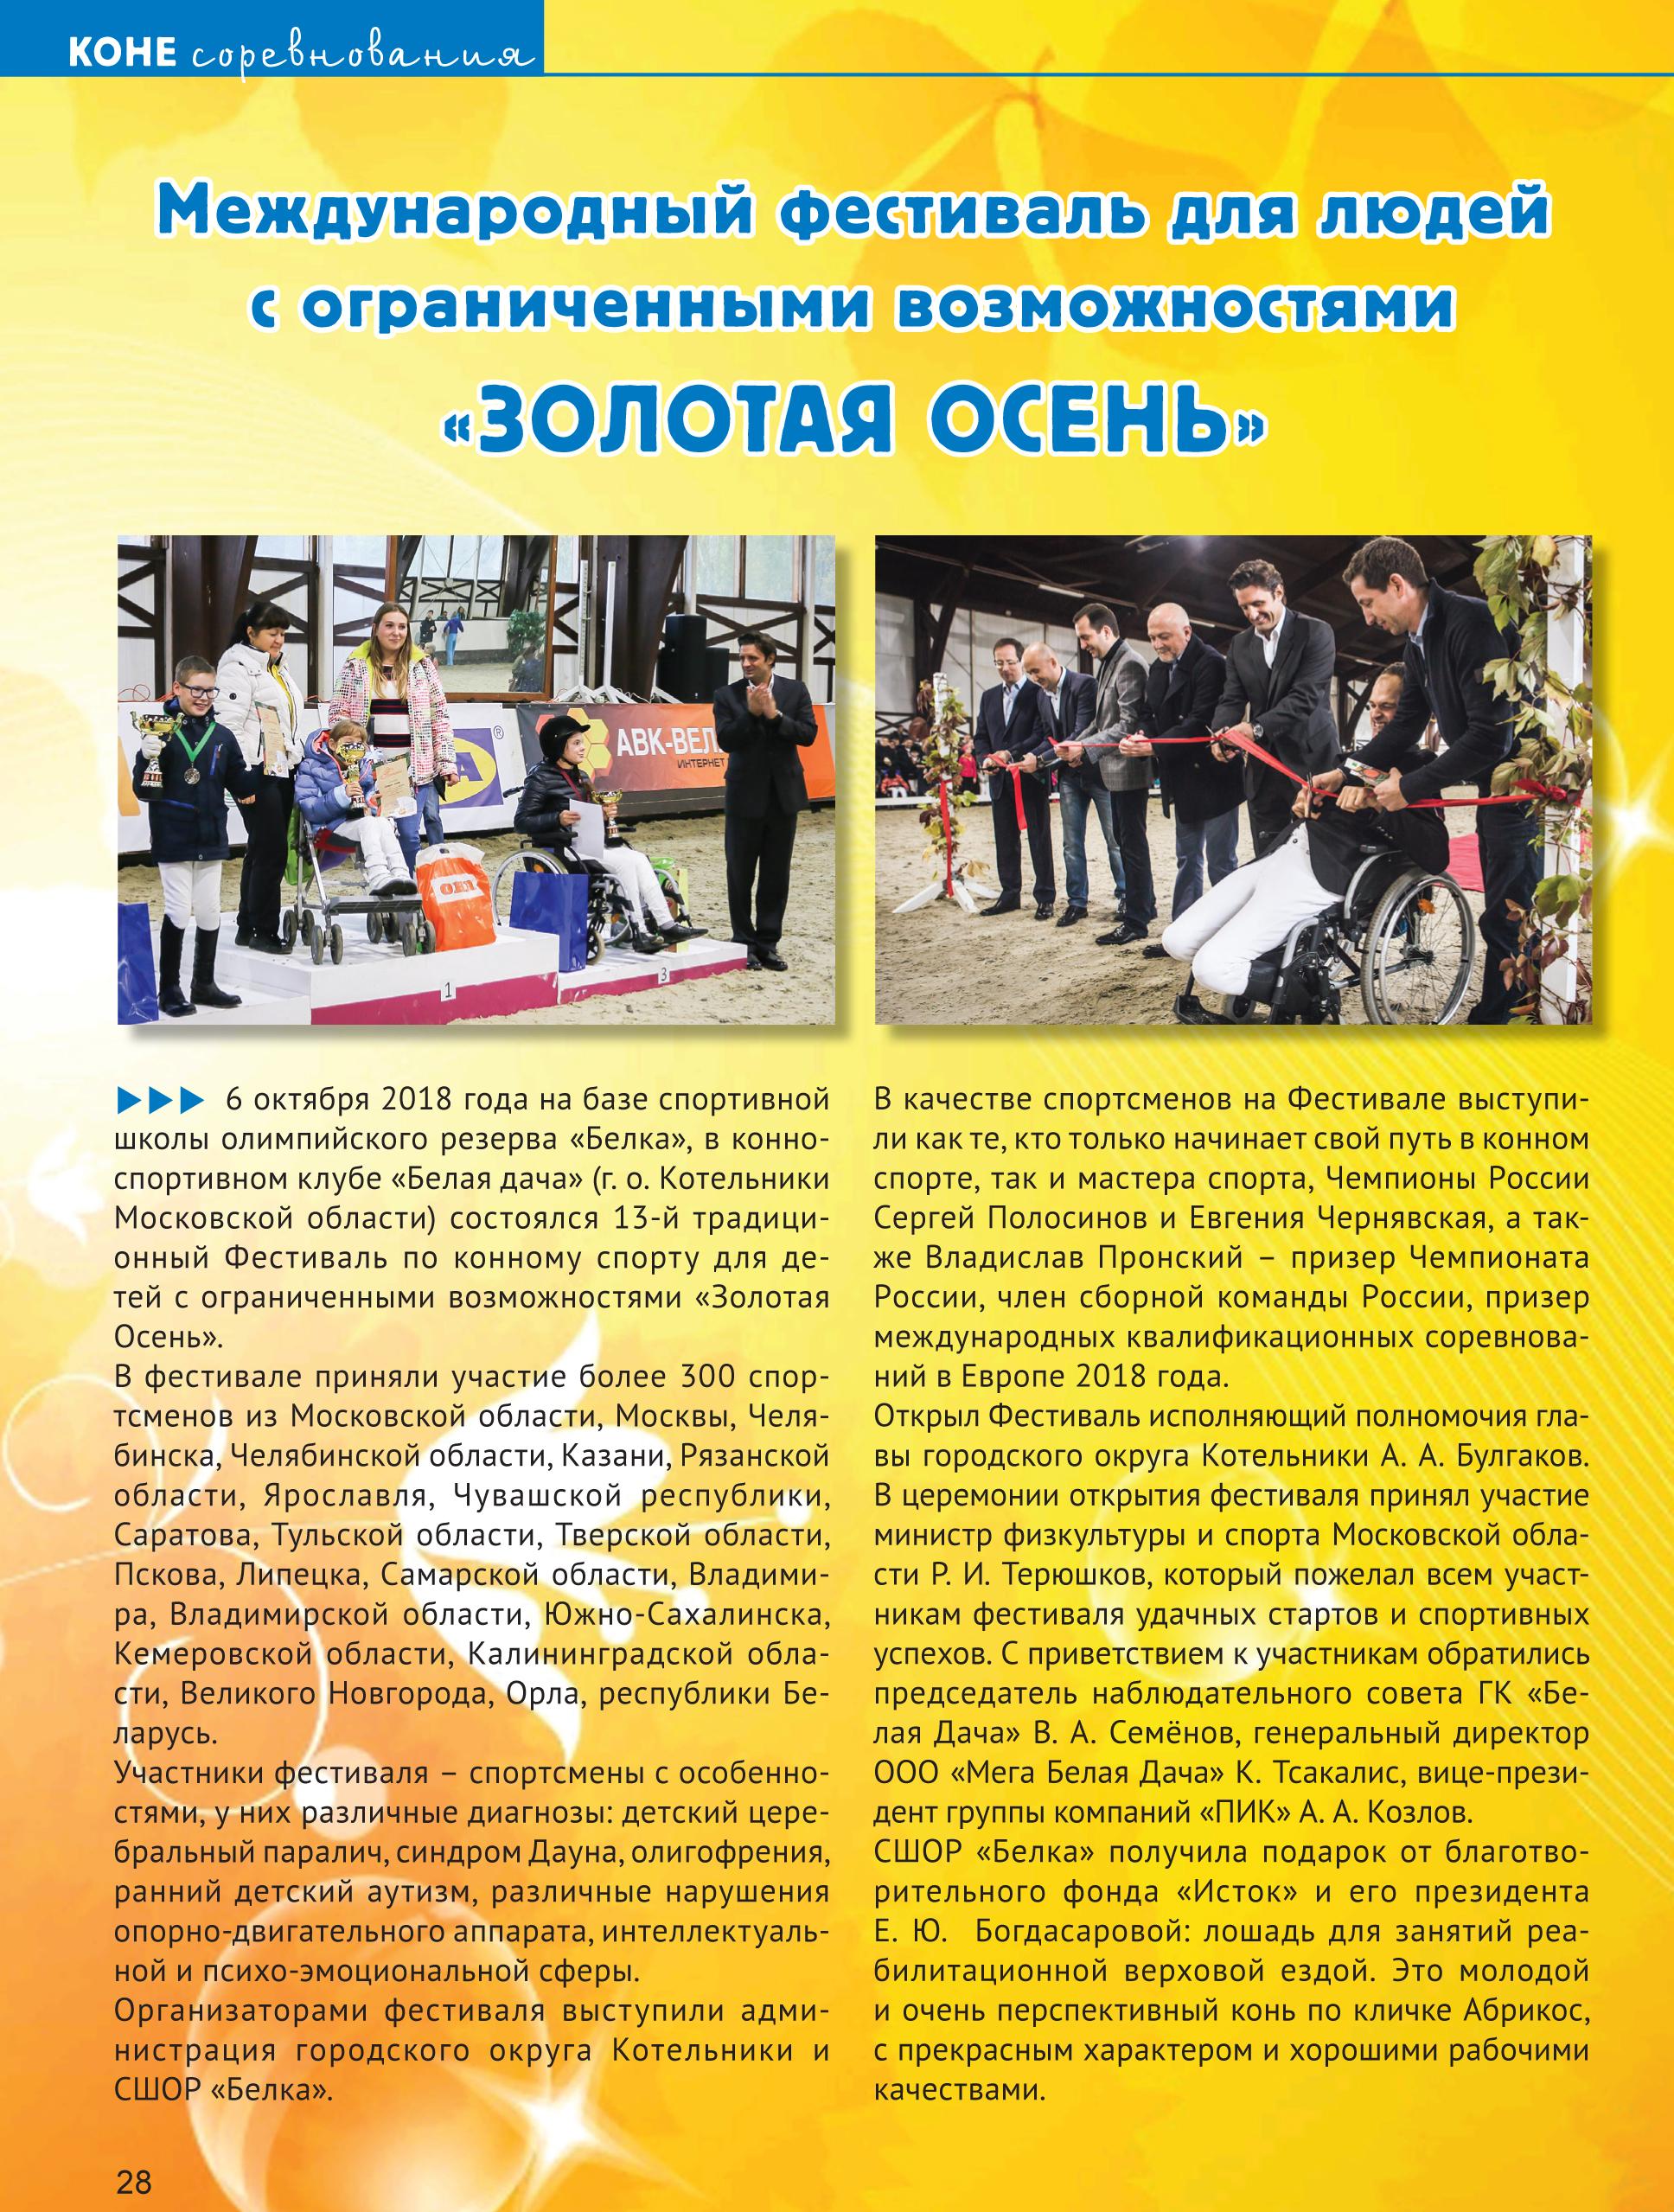 Book KONEVODITEL 62018 print-28